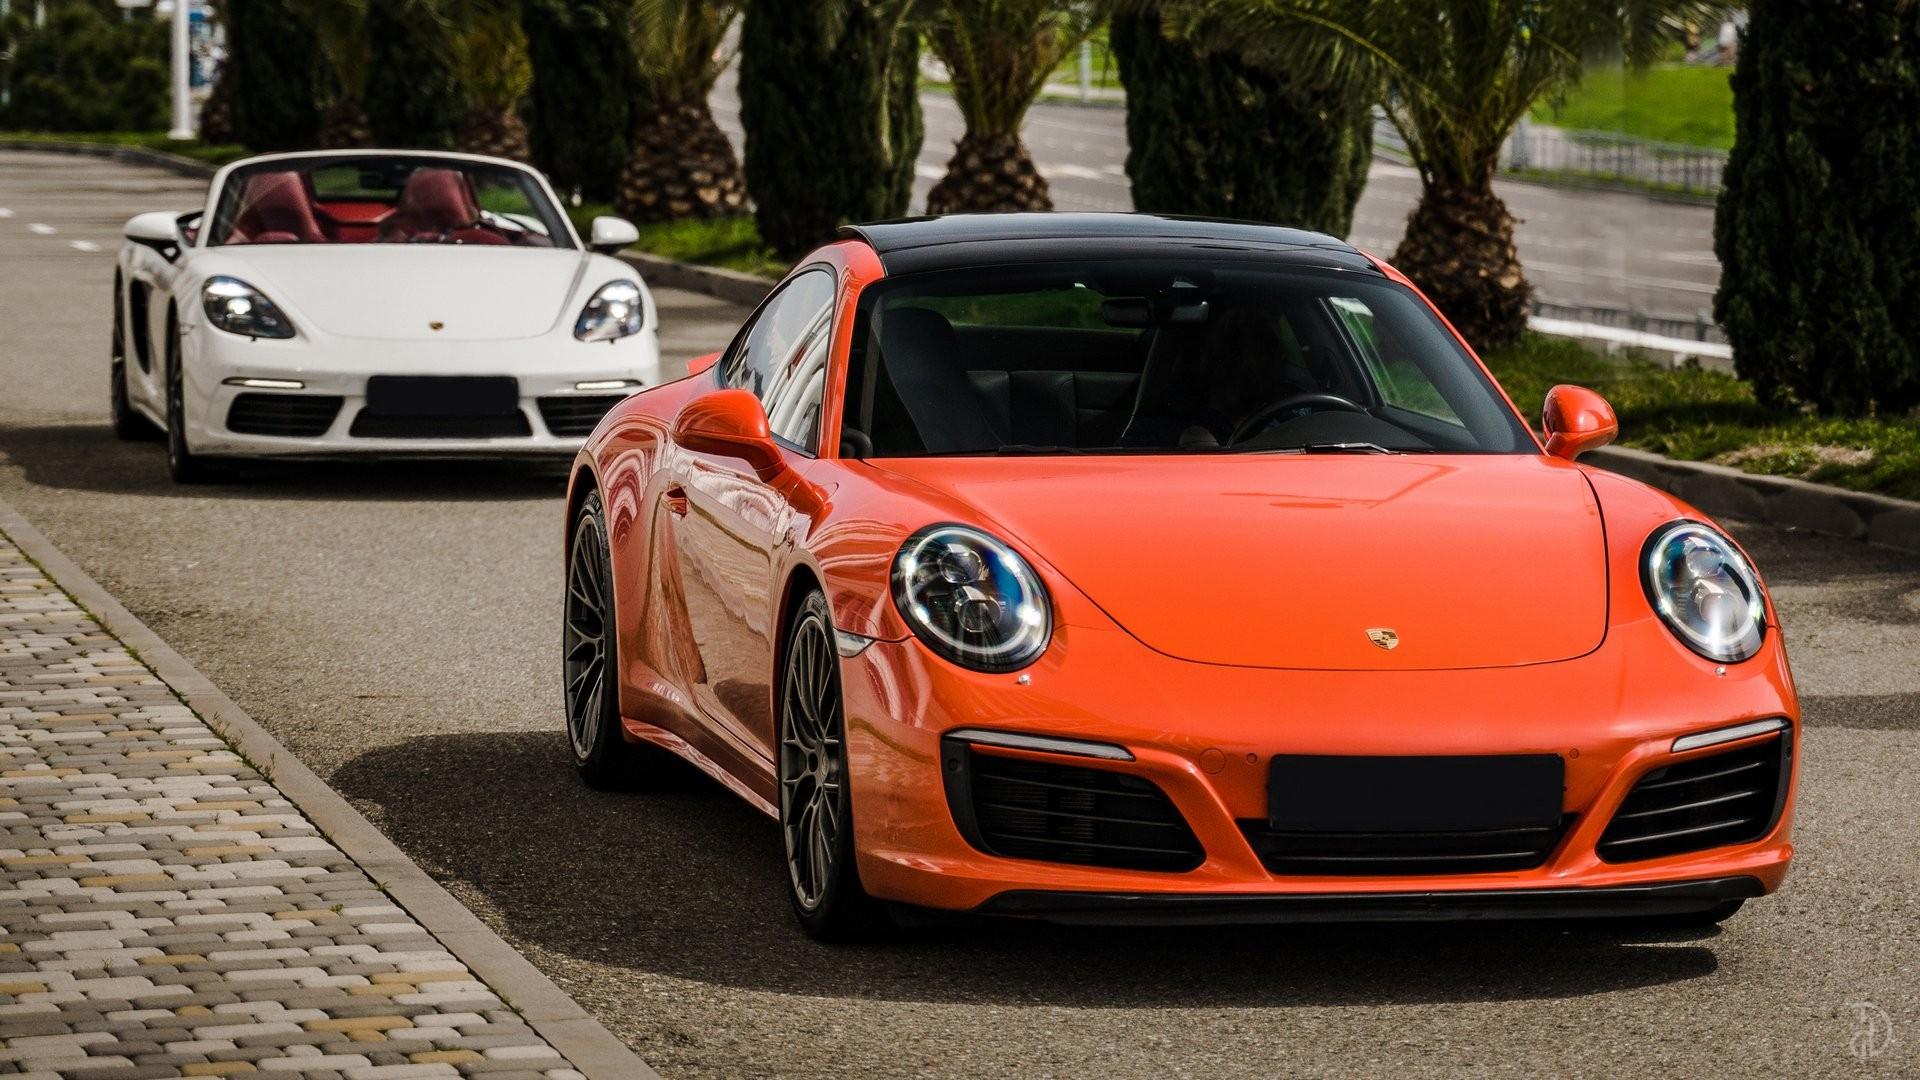 Аренда Porsche 911 Carrera 4S в Сочи. Фото 18